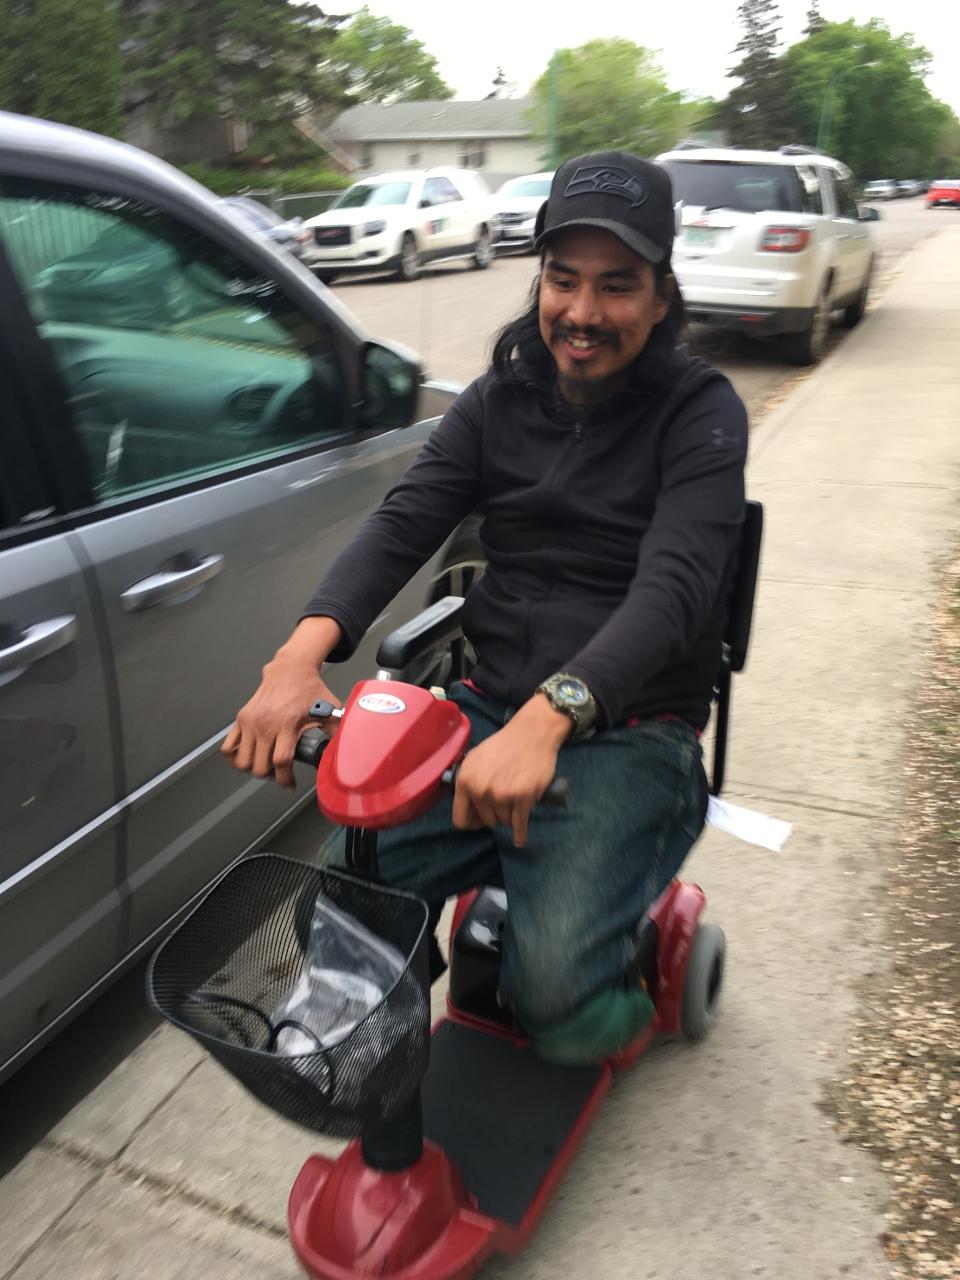 Howard Desjarlais receives a scooter from Sylvia Spicer and Kelly Speiler. (Taylor Rattray / CTV Regina)